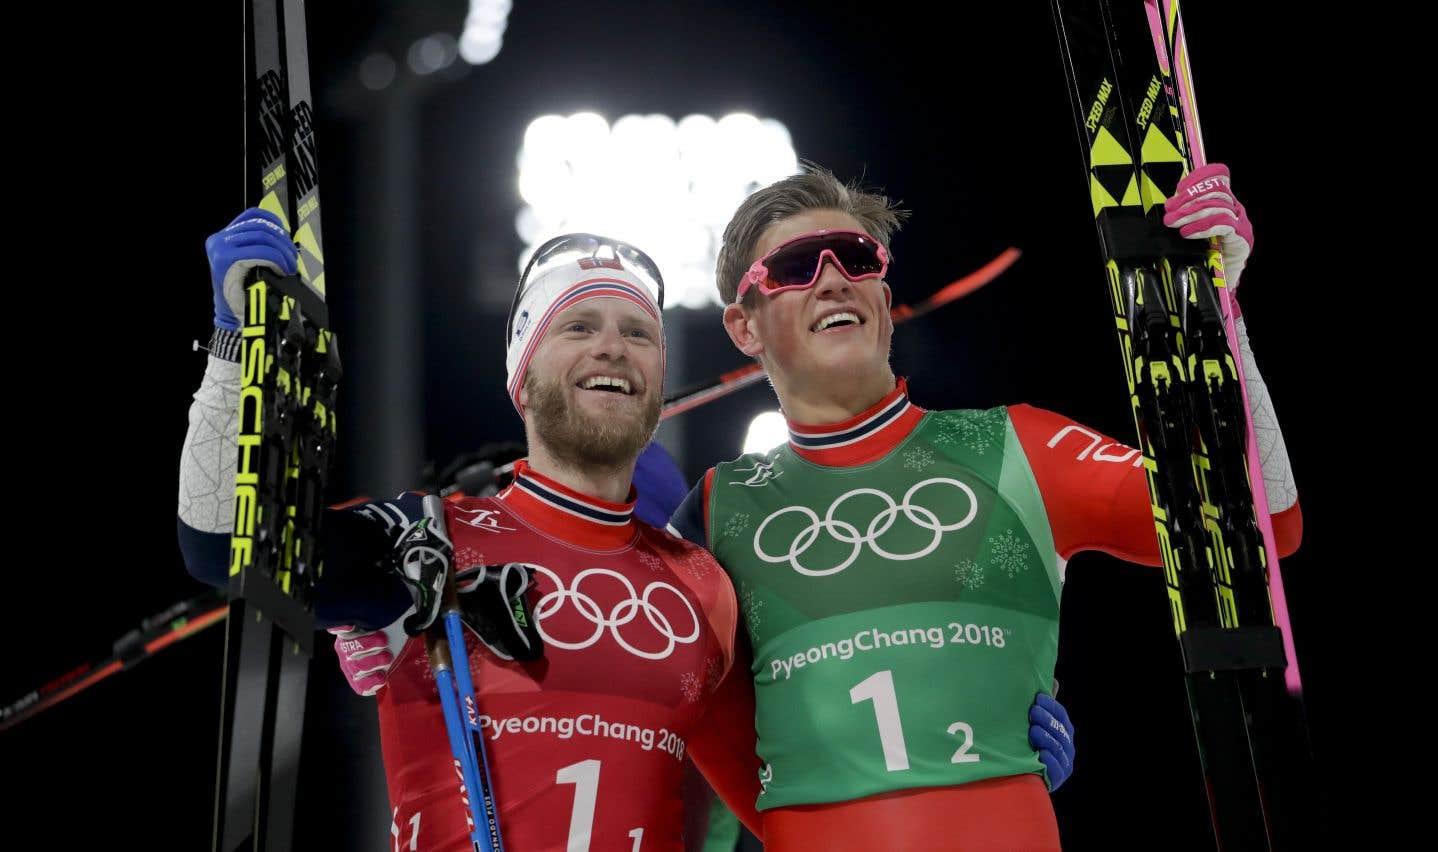 Martin Johnsrud Sundby et Johannes Hoesflot Klaebo